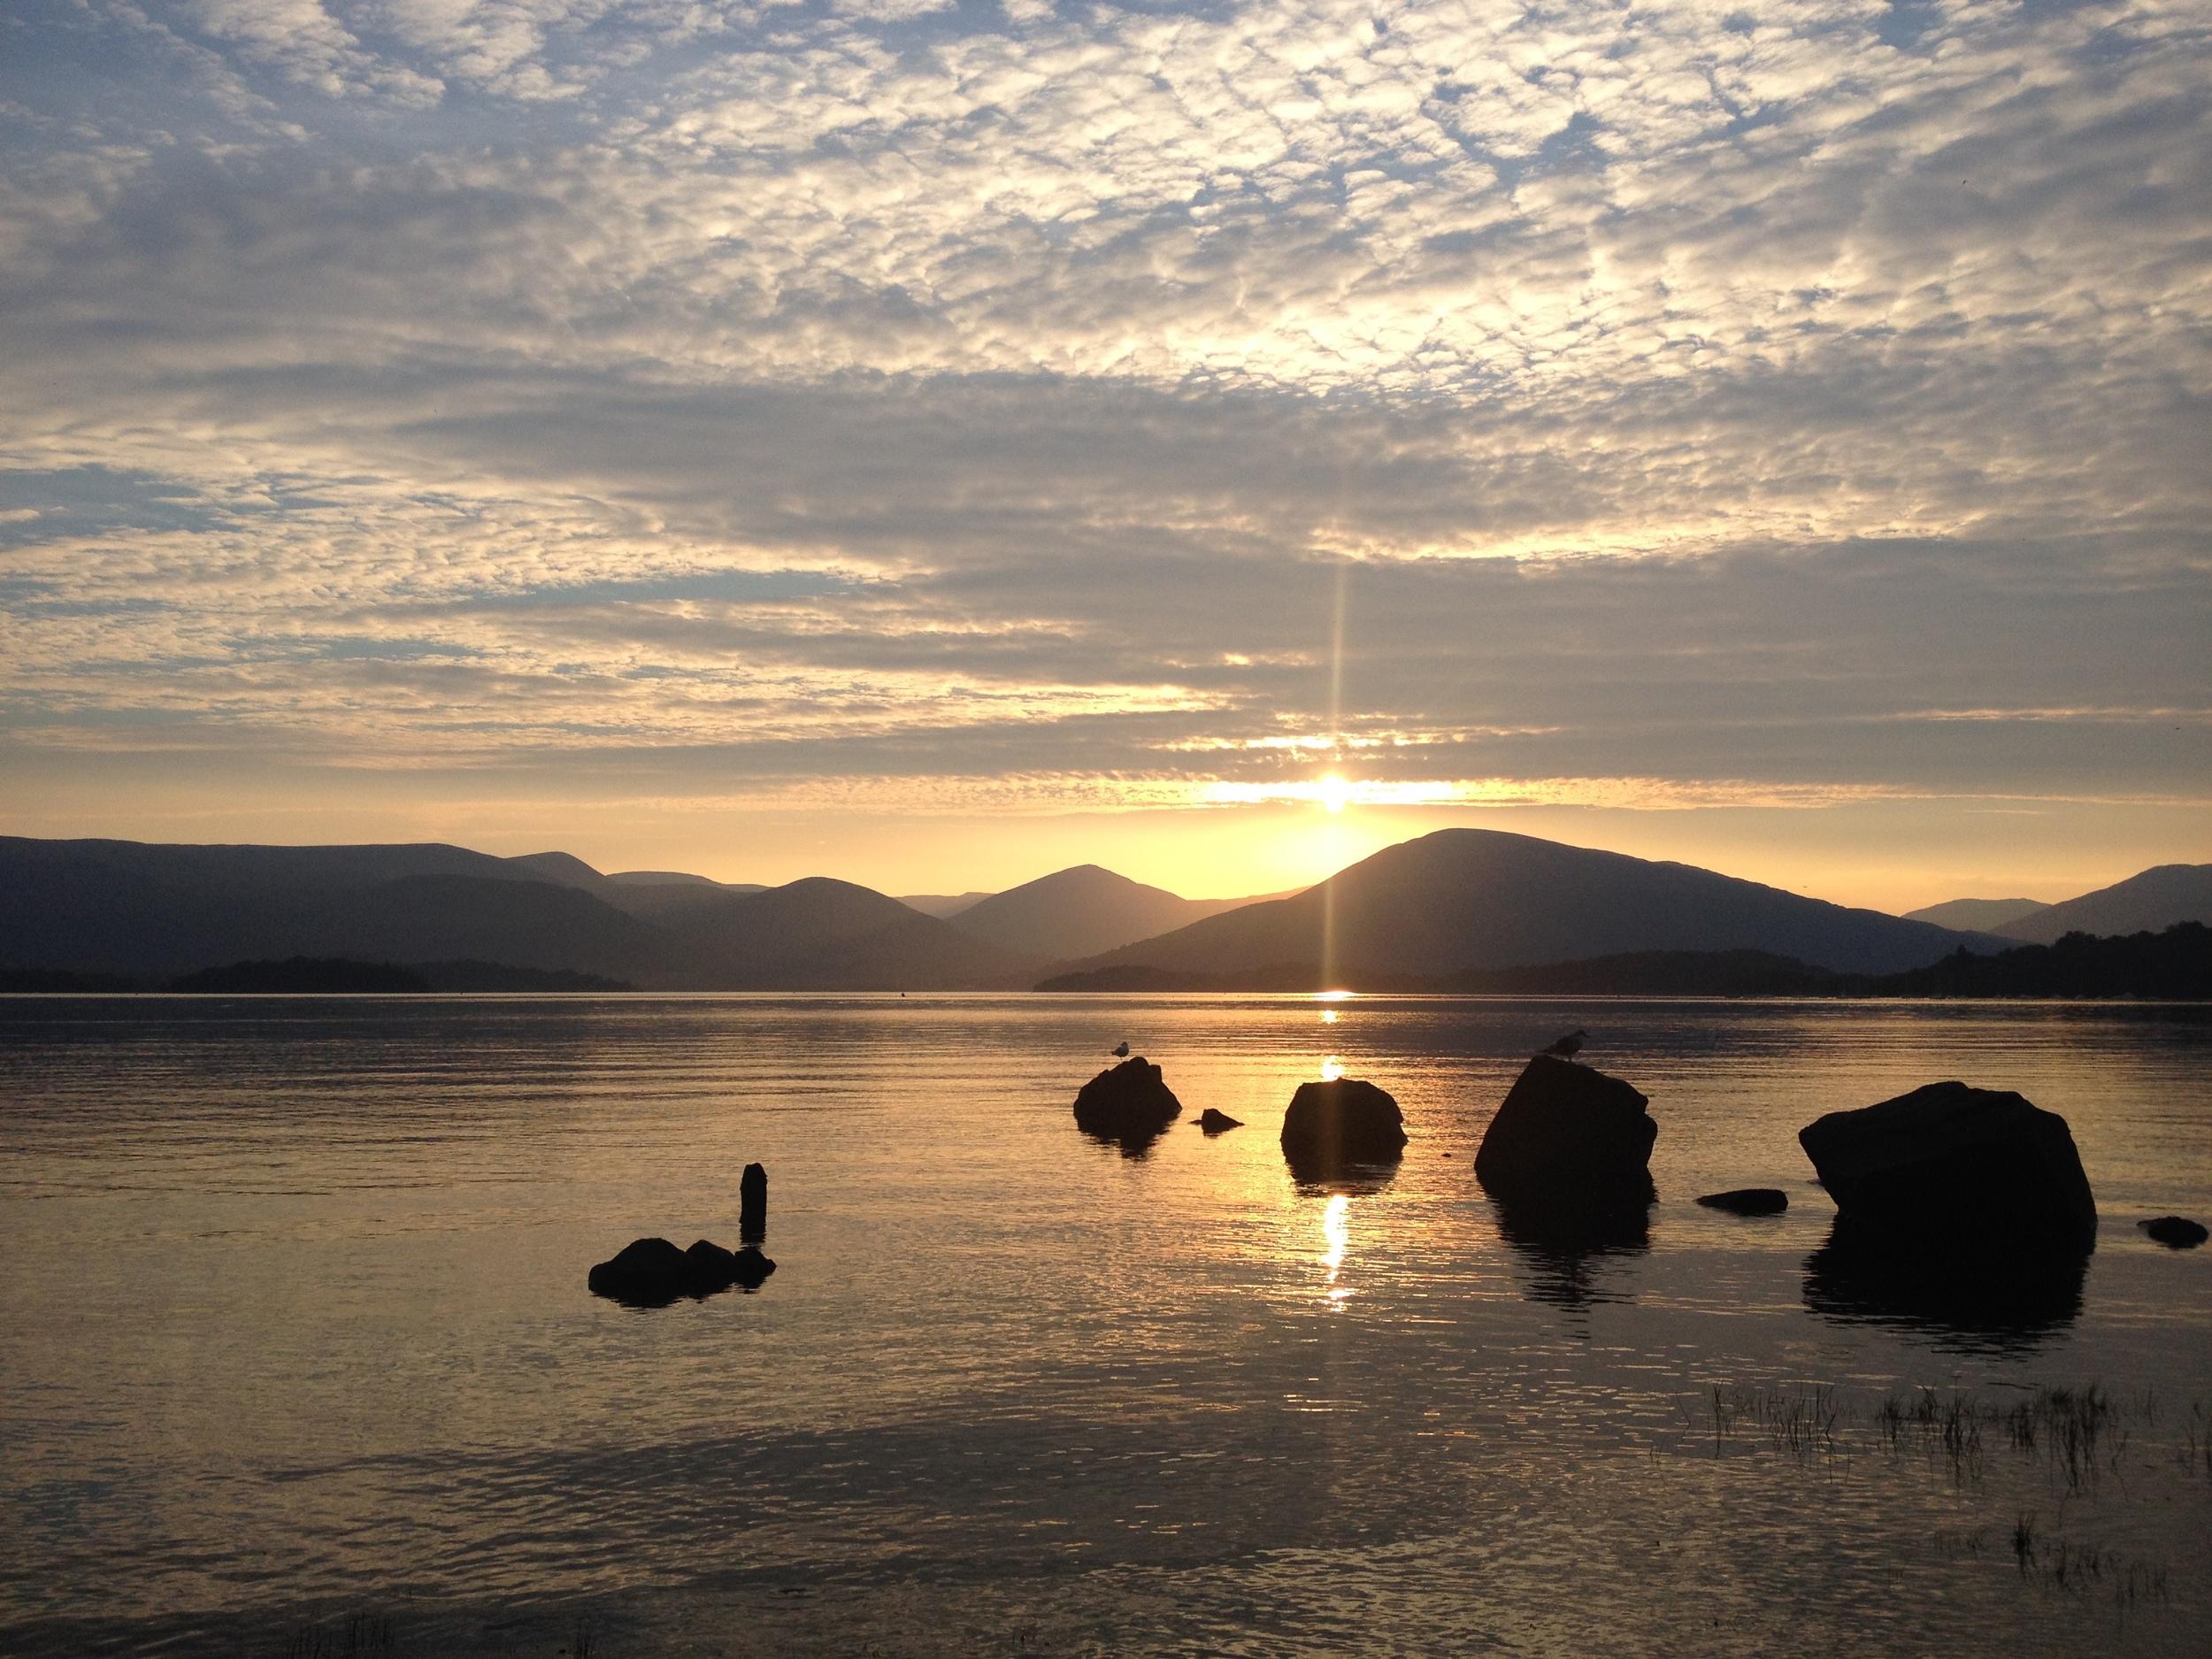 sunset-over-loch-lomond